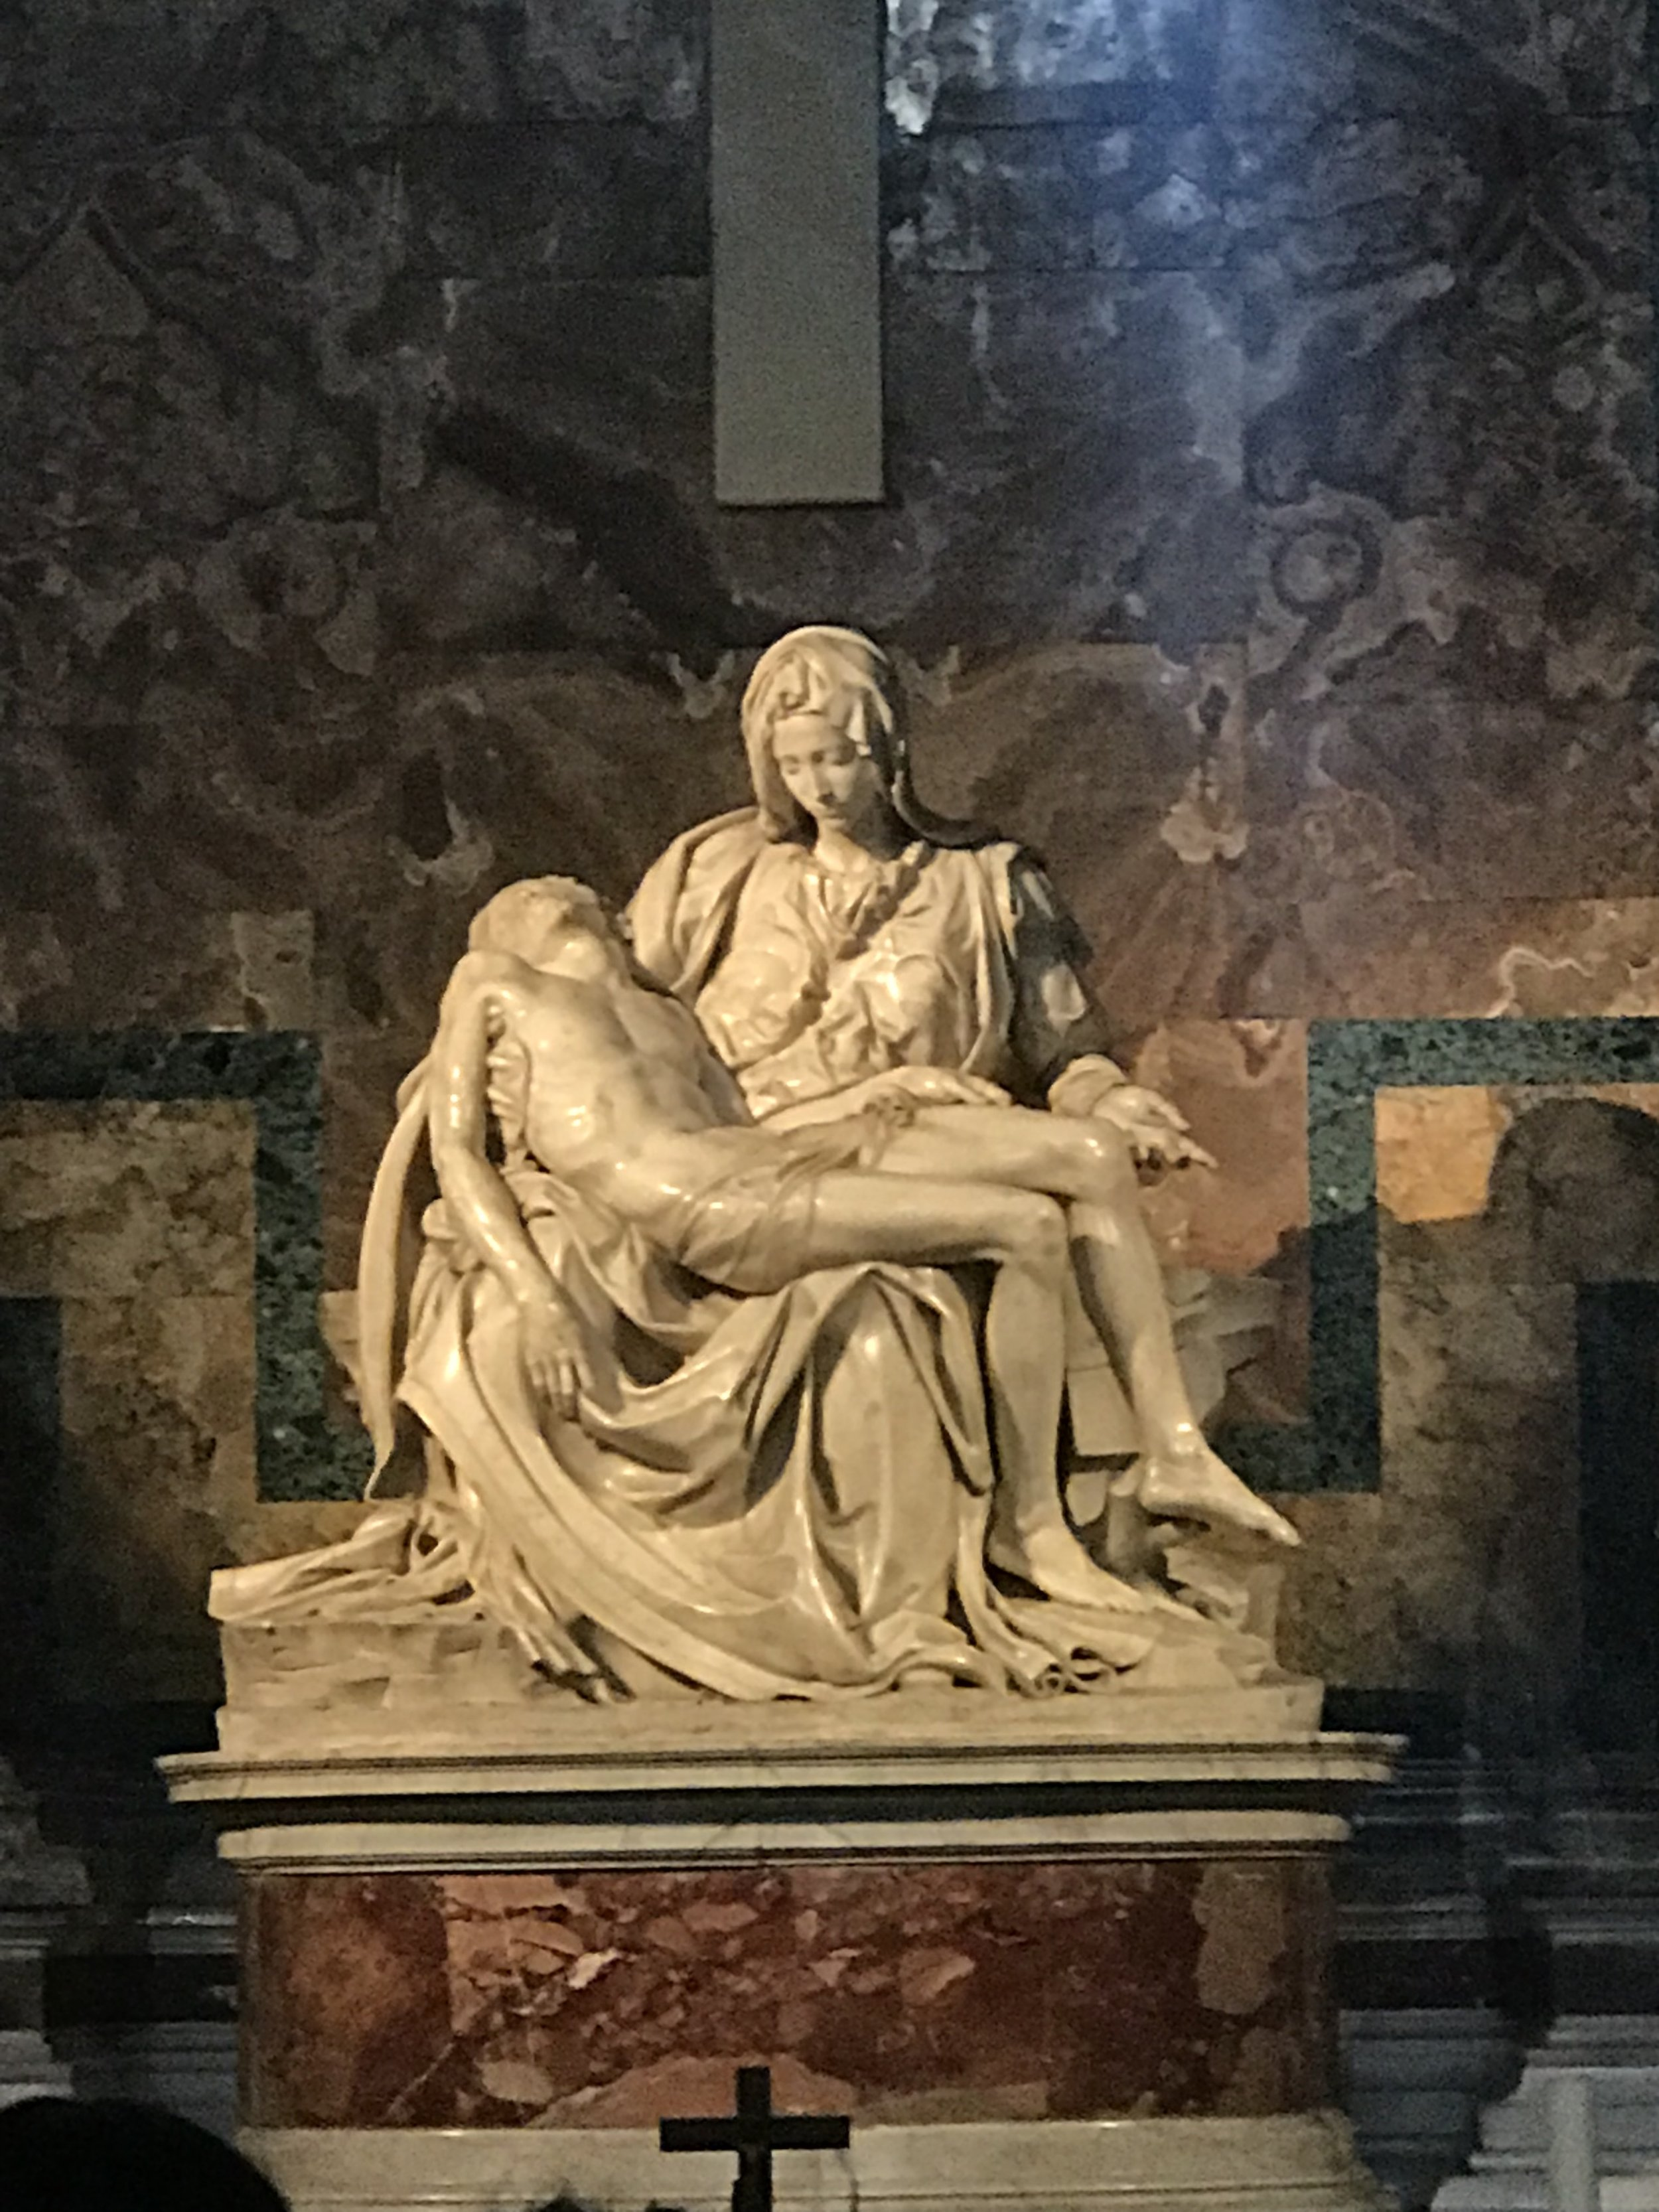 Michelangelo's Pieta at St. Peter's Basilica.